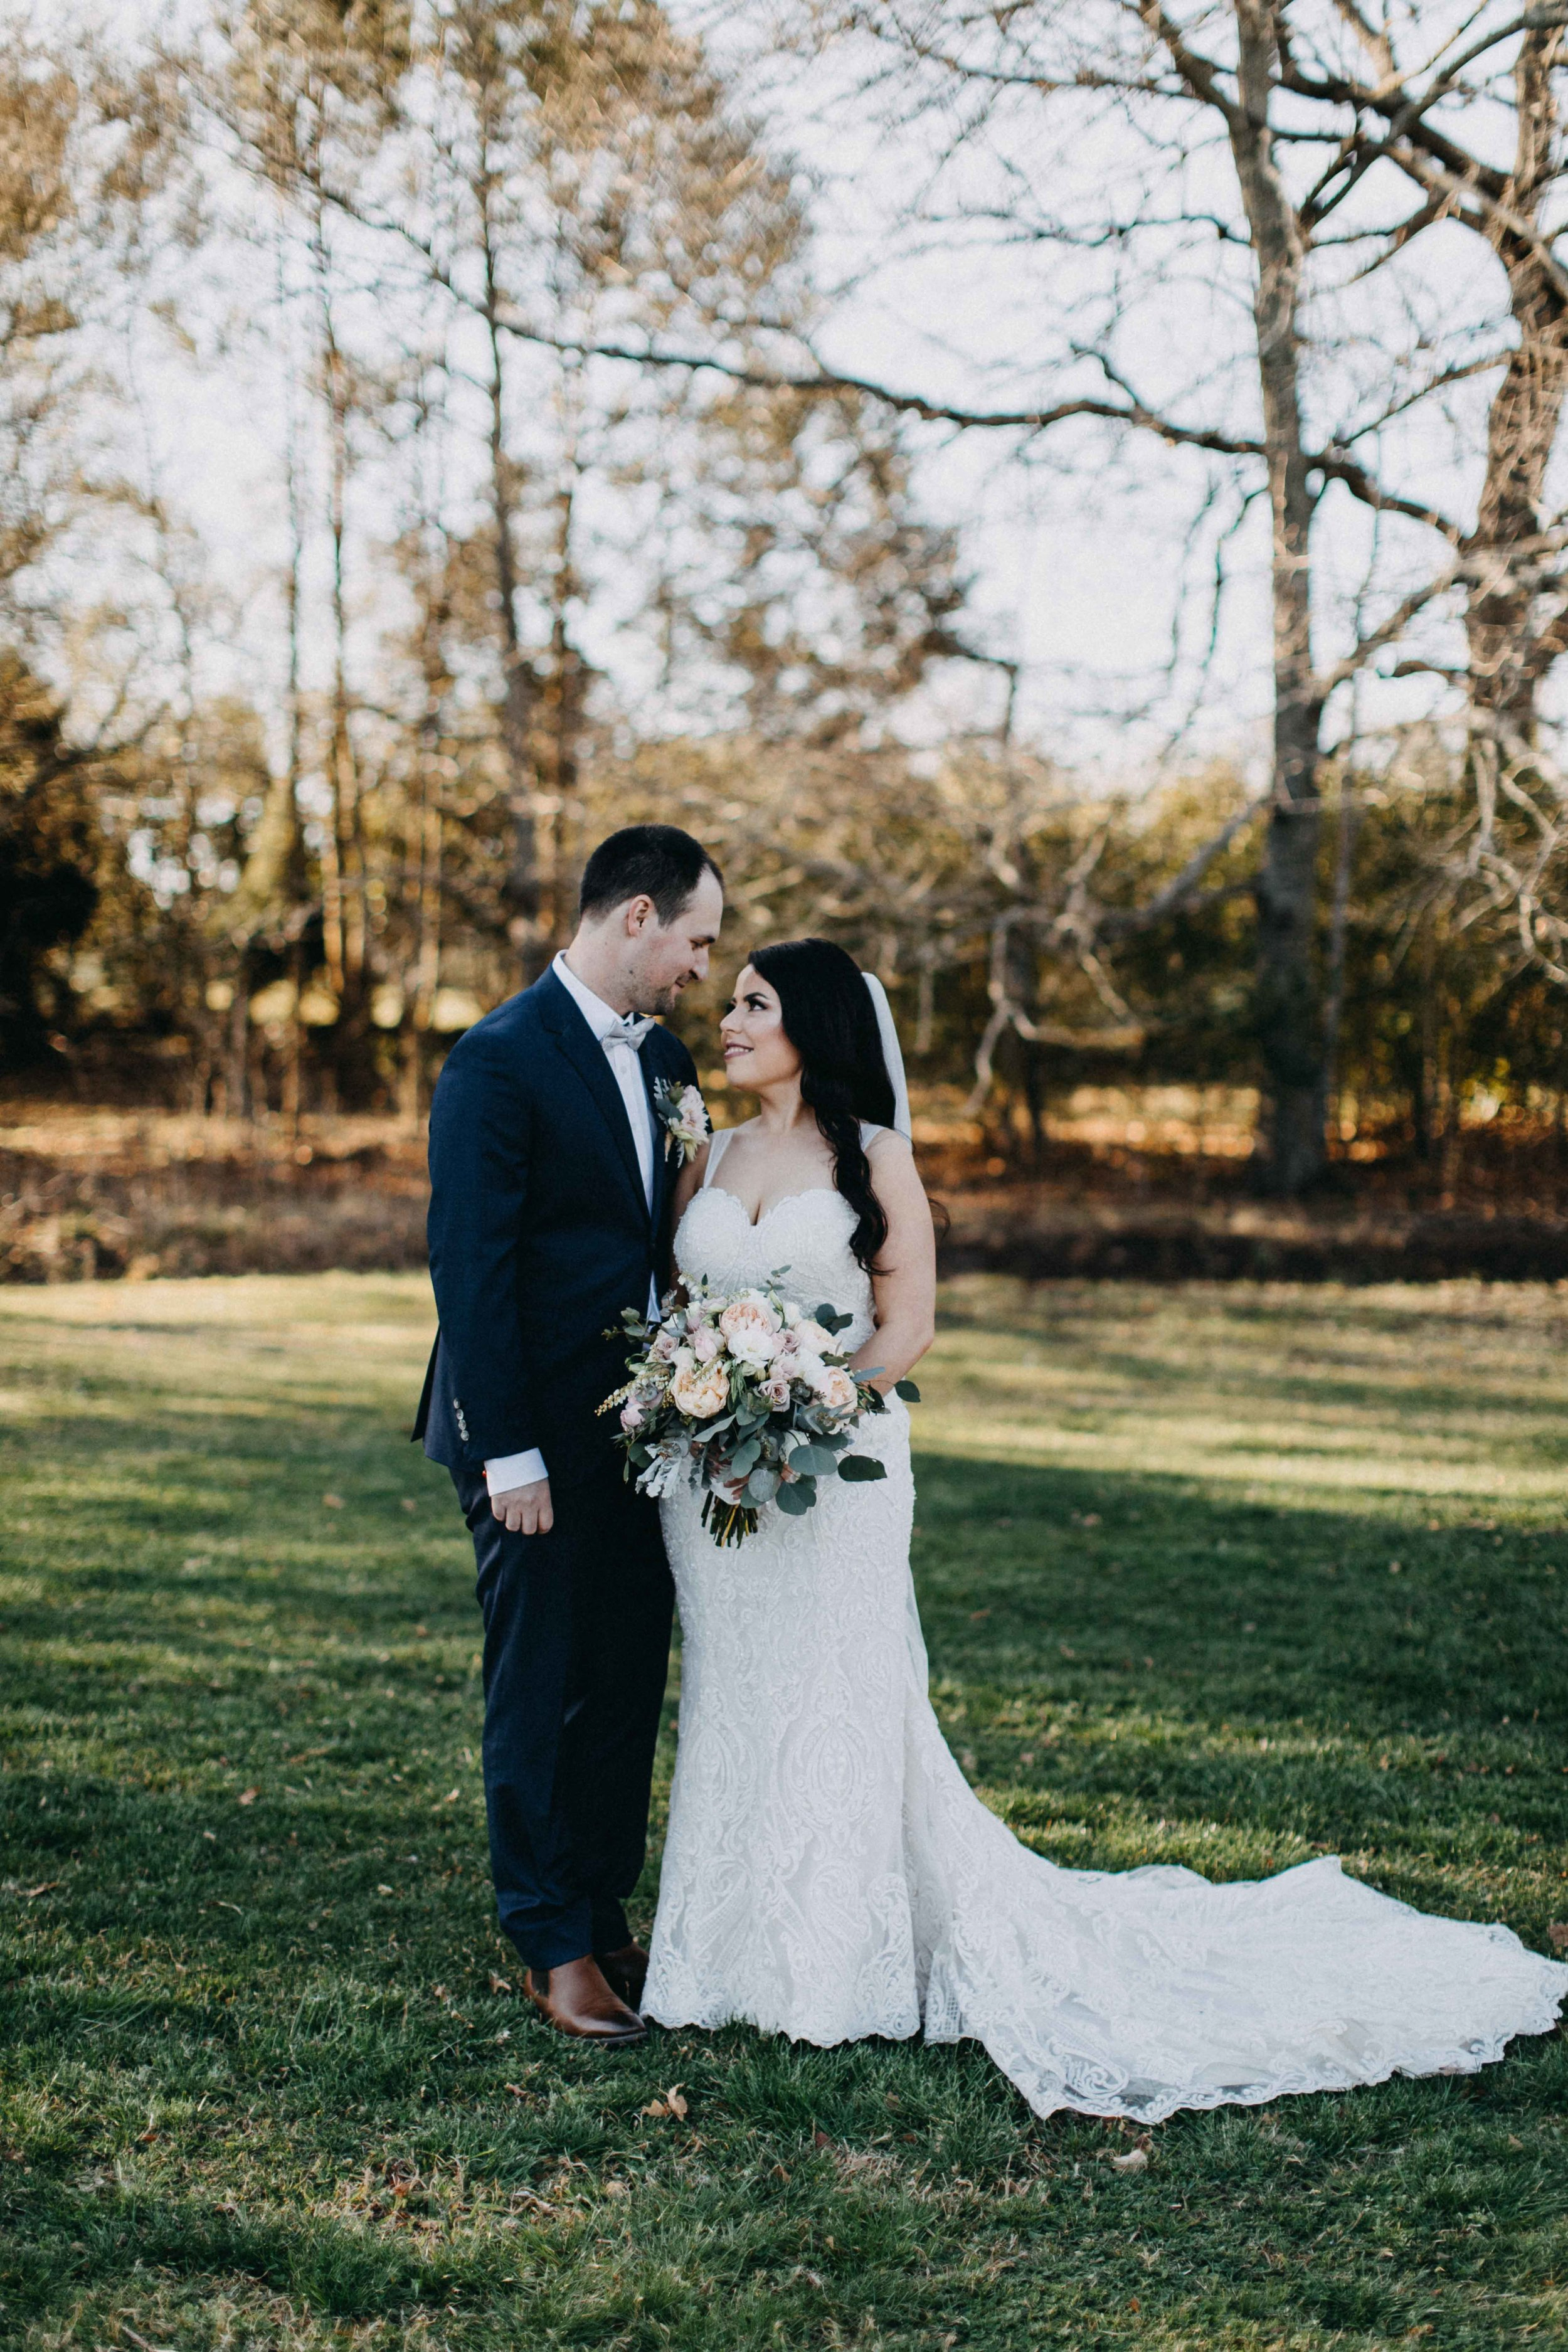 exeter-southern-highlands-wedding-www.emilyobrienphotography.net -82.jpg